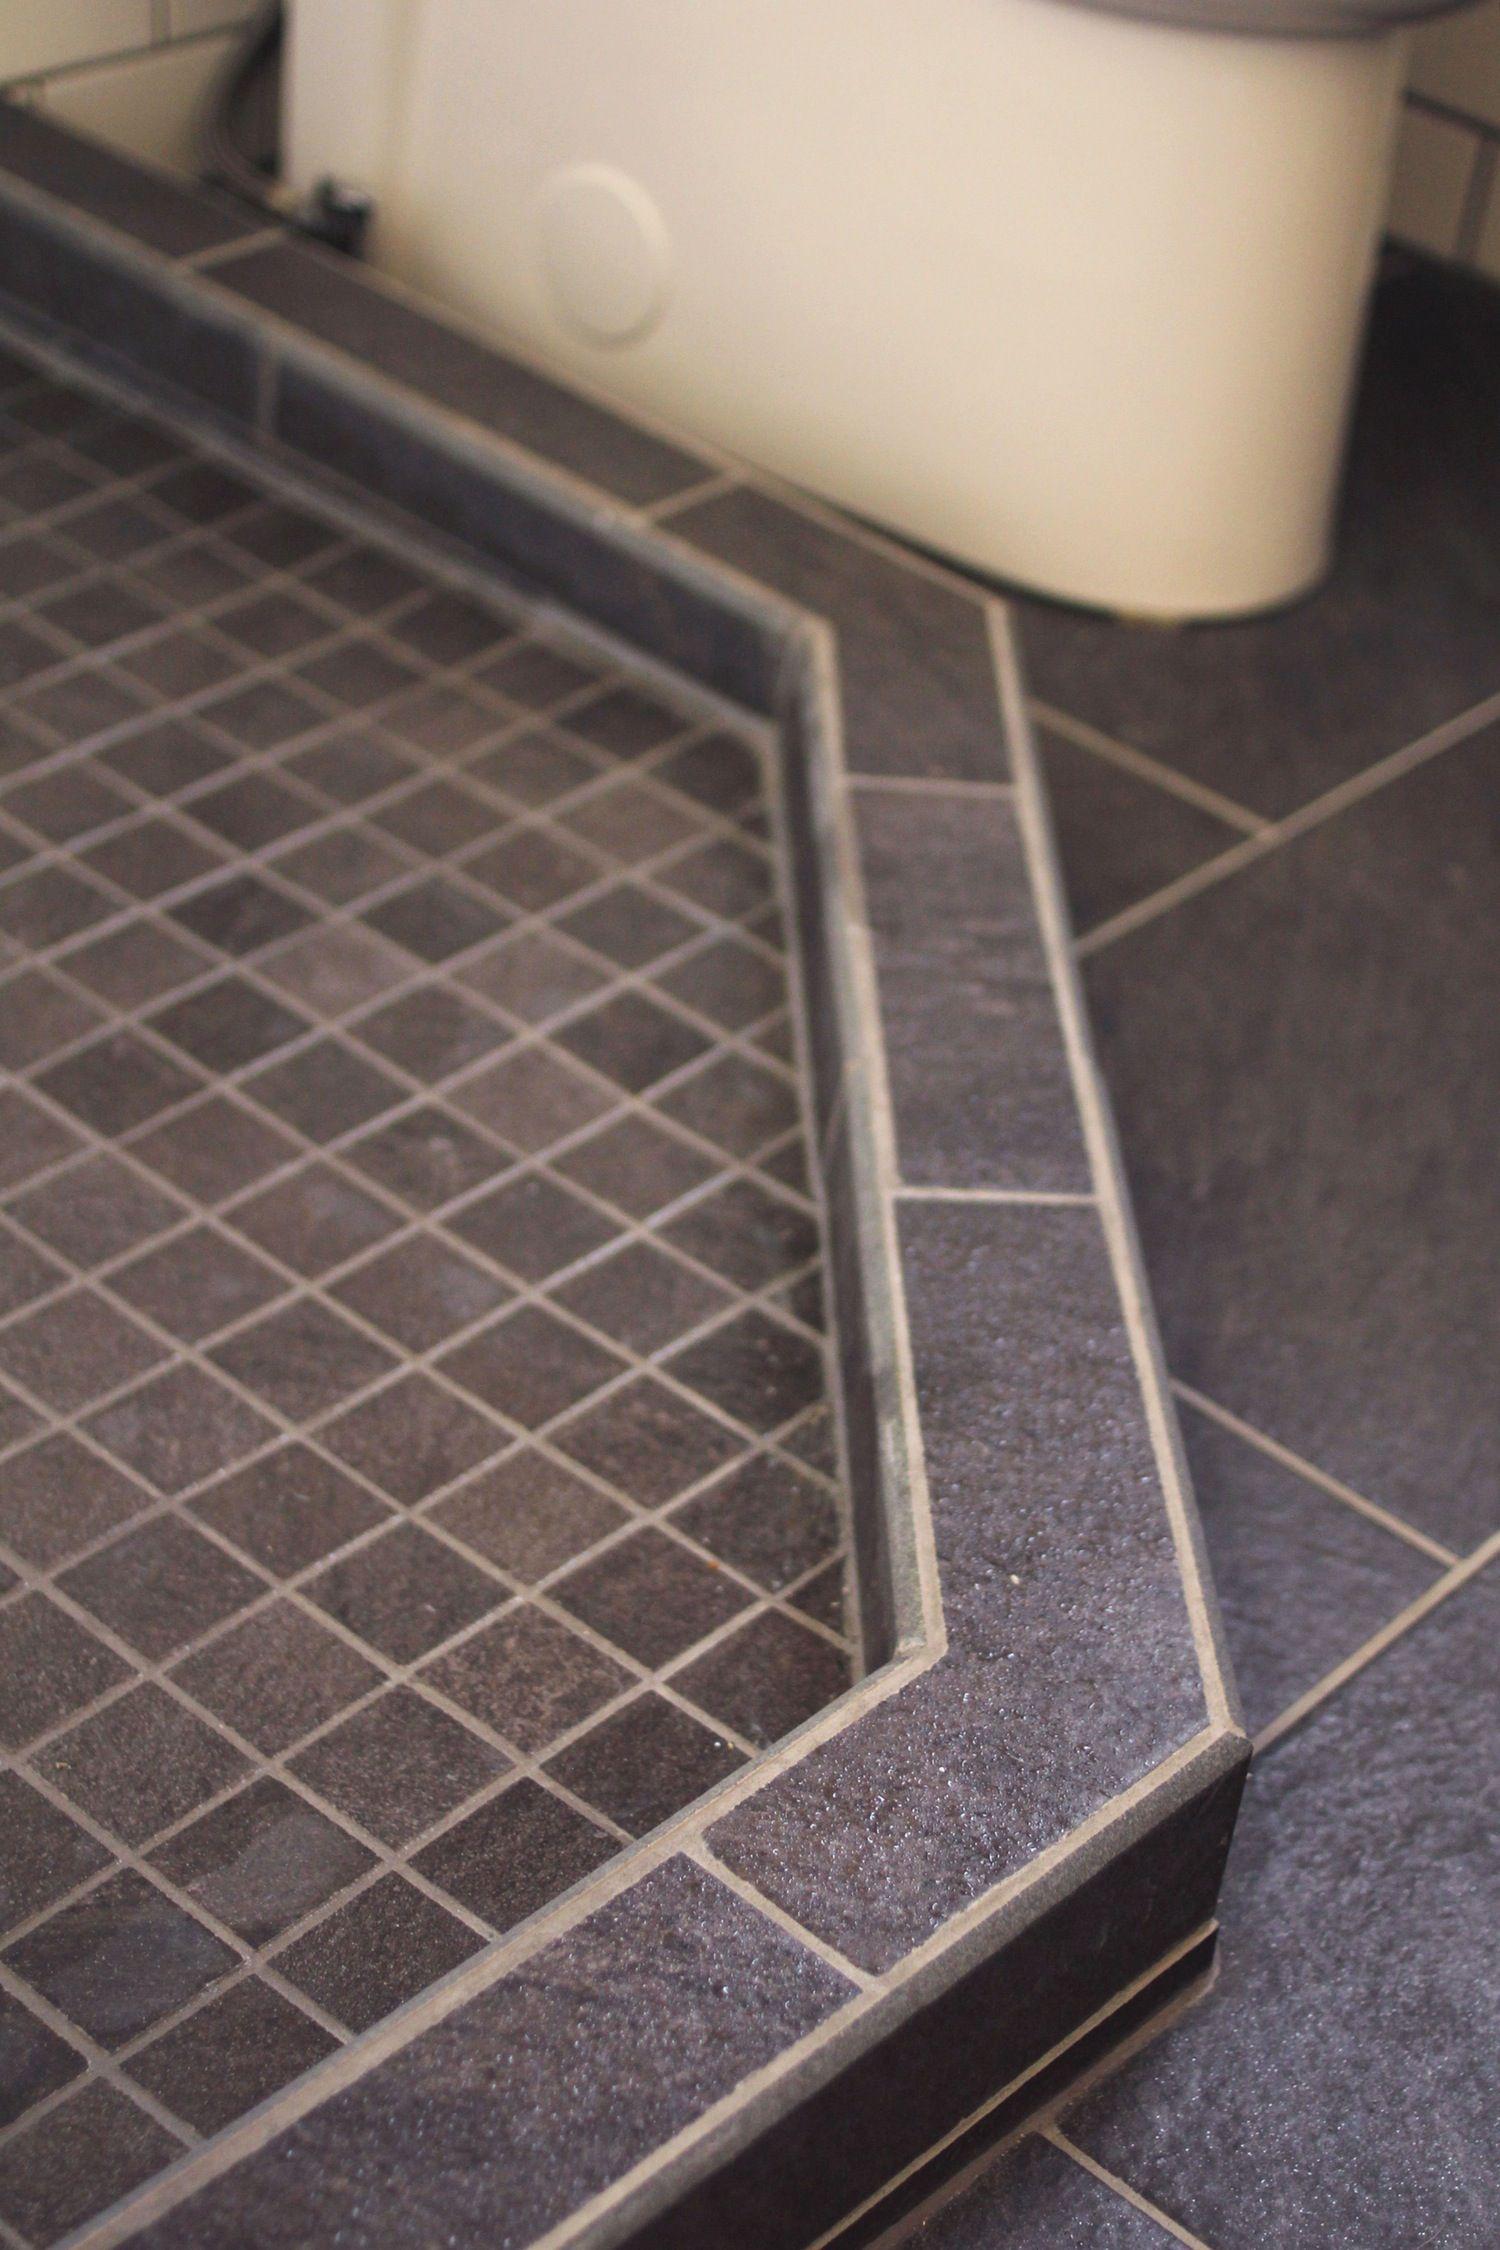 How to Build a Custom Tiled Shower Pan | Tile shower pan, Shower ...